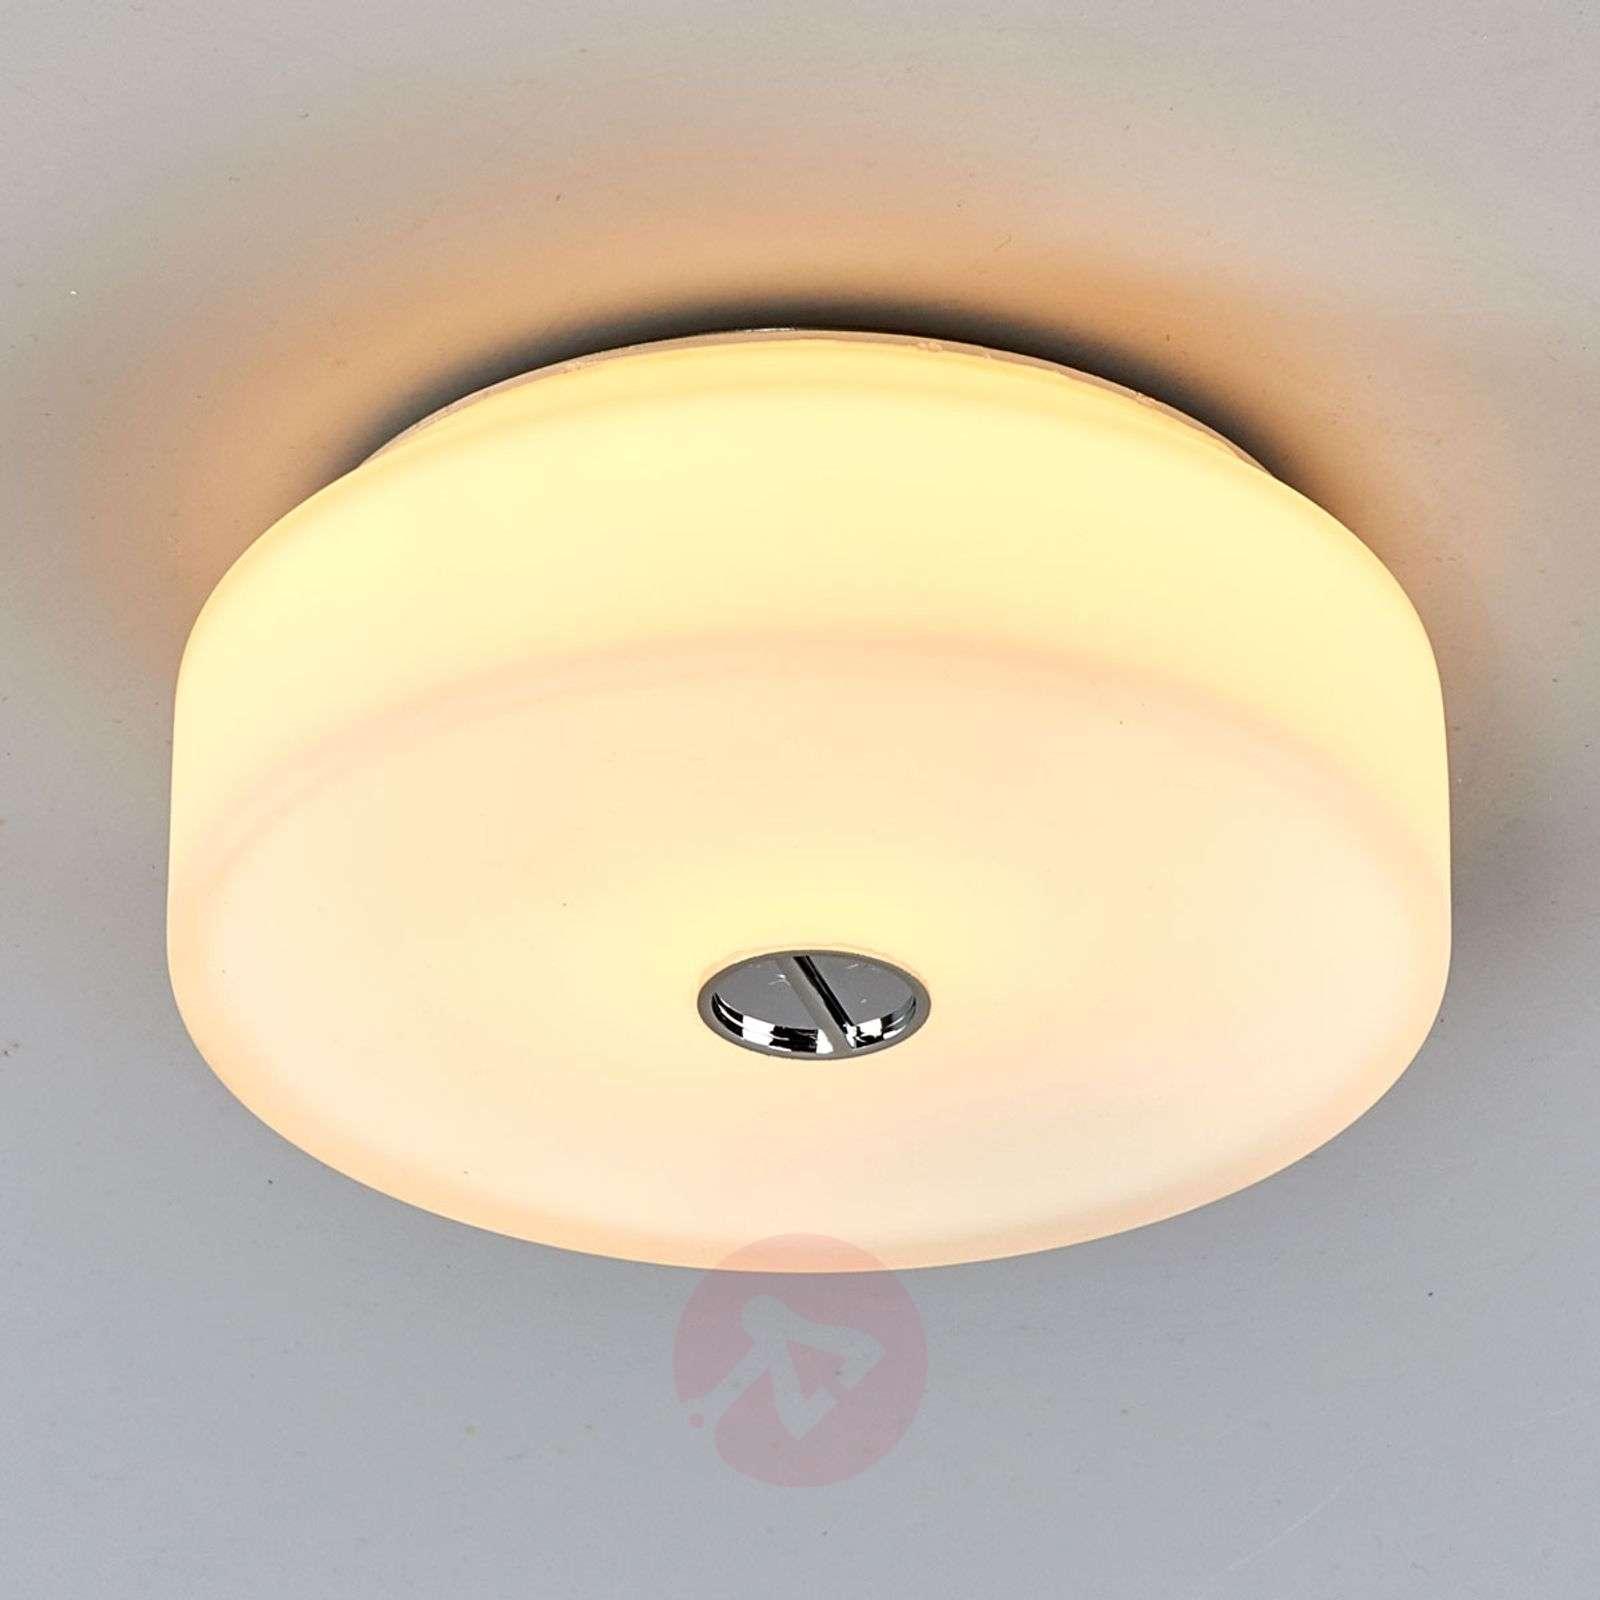 Mini button ceiling light by flos lights mini button ceiling light by flos 3510082 04 mozeypictures Image collections